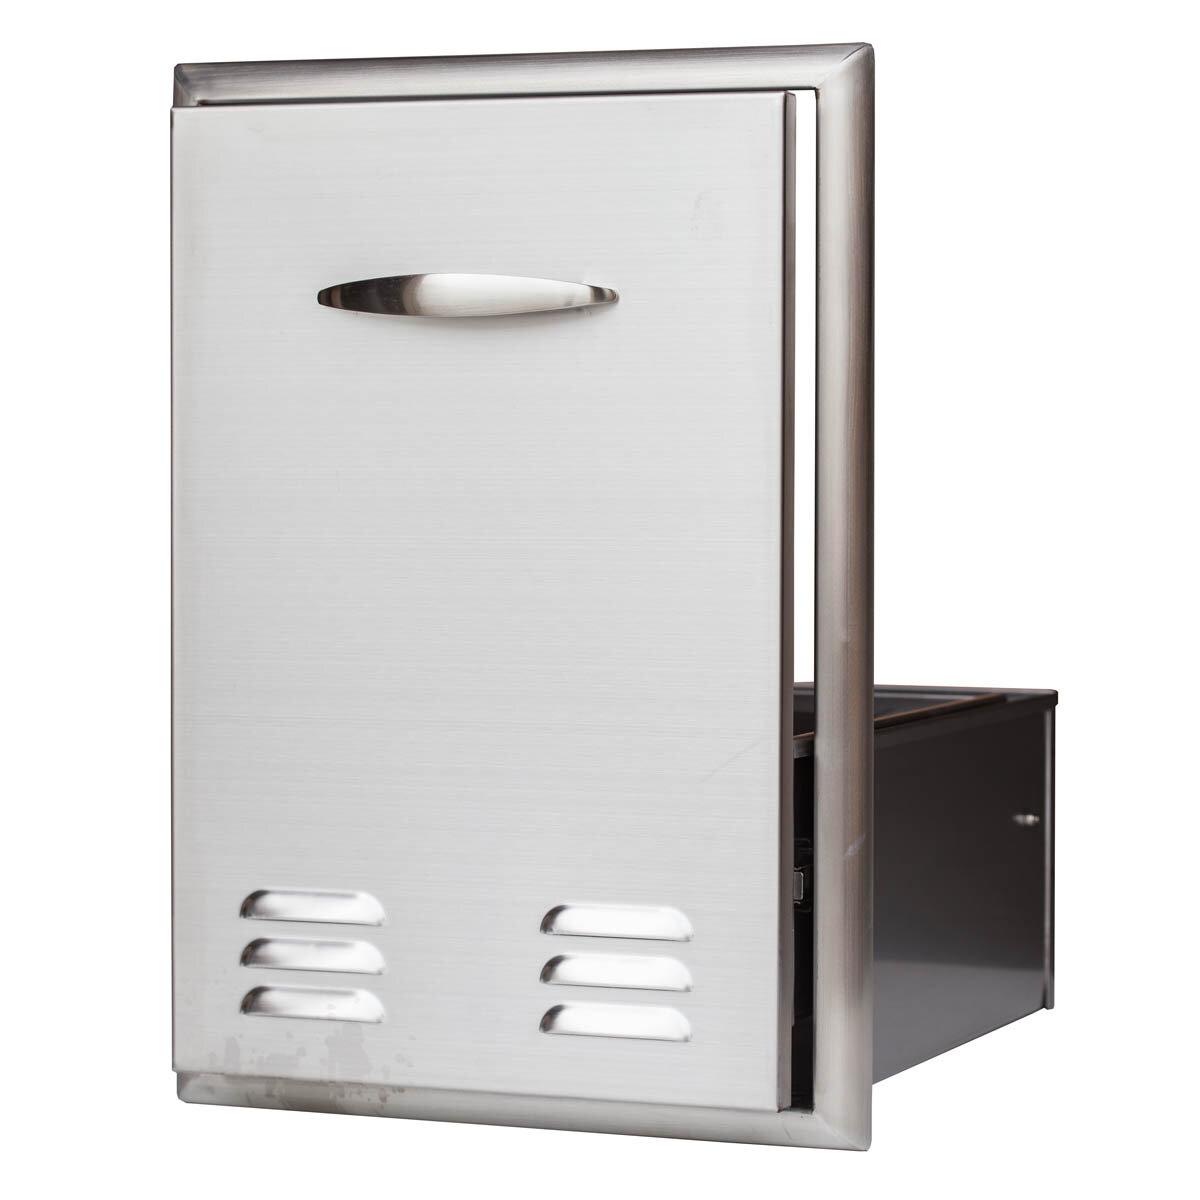 barbeques galore tank and trash can side drawer ebay. Black Bedroom Furniture Sets. Home Design Ideas